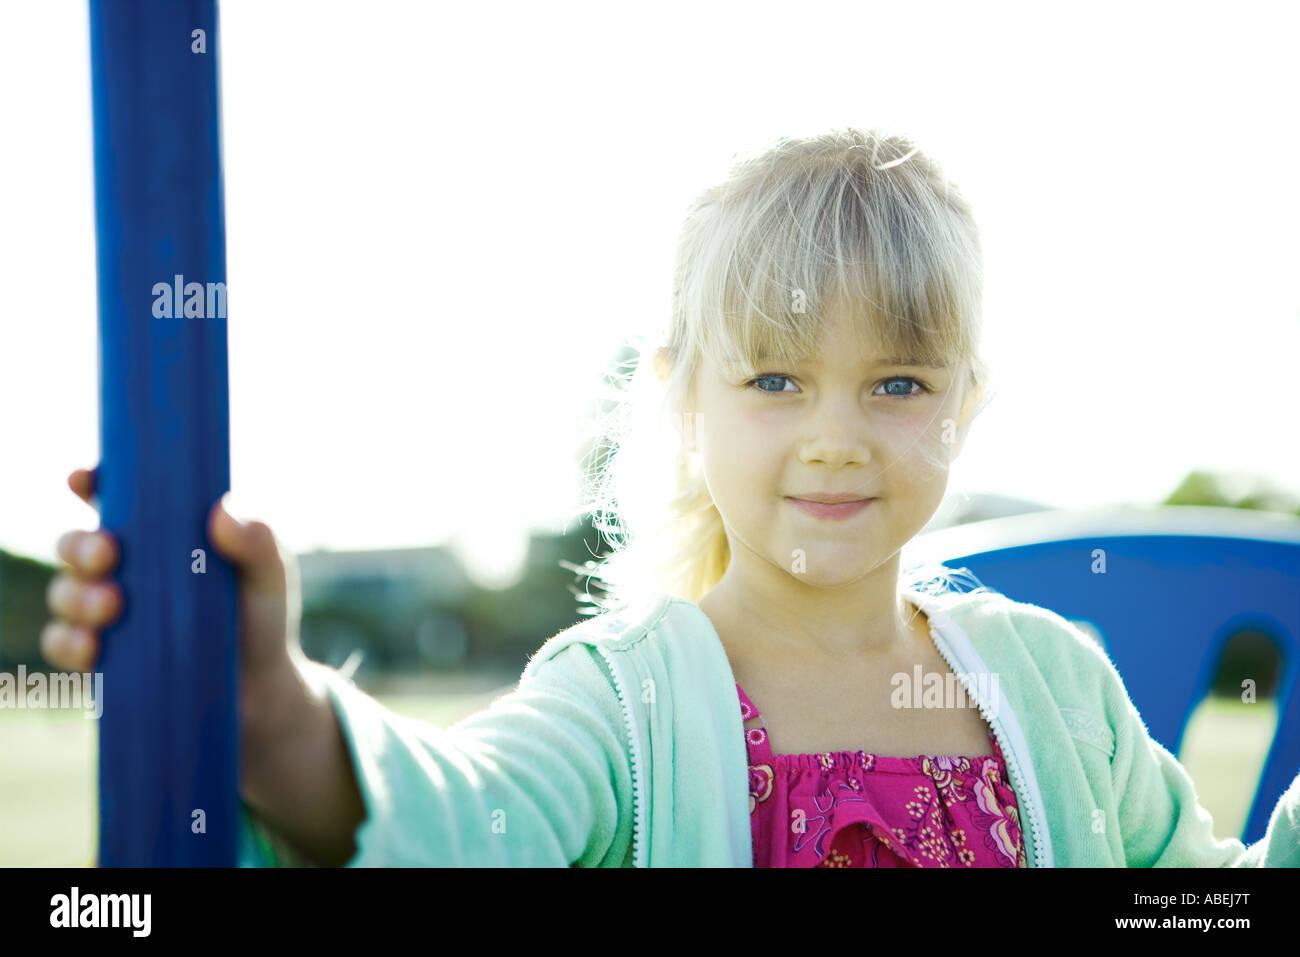 Girl on playground equipment, smiling at camera - Stock Image